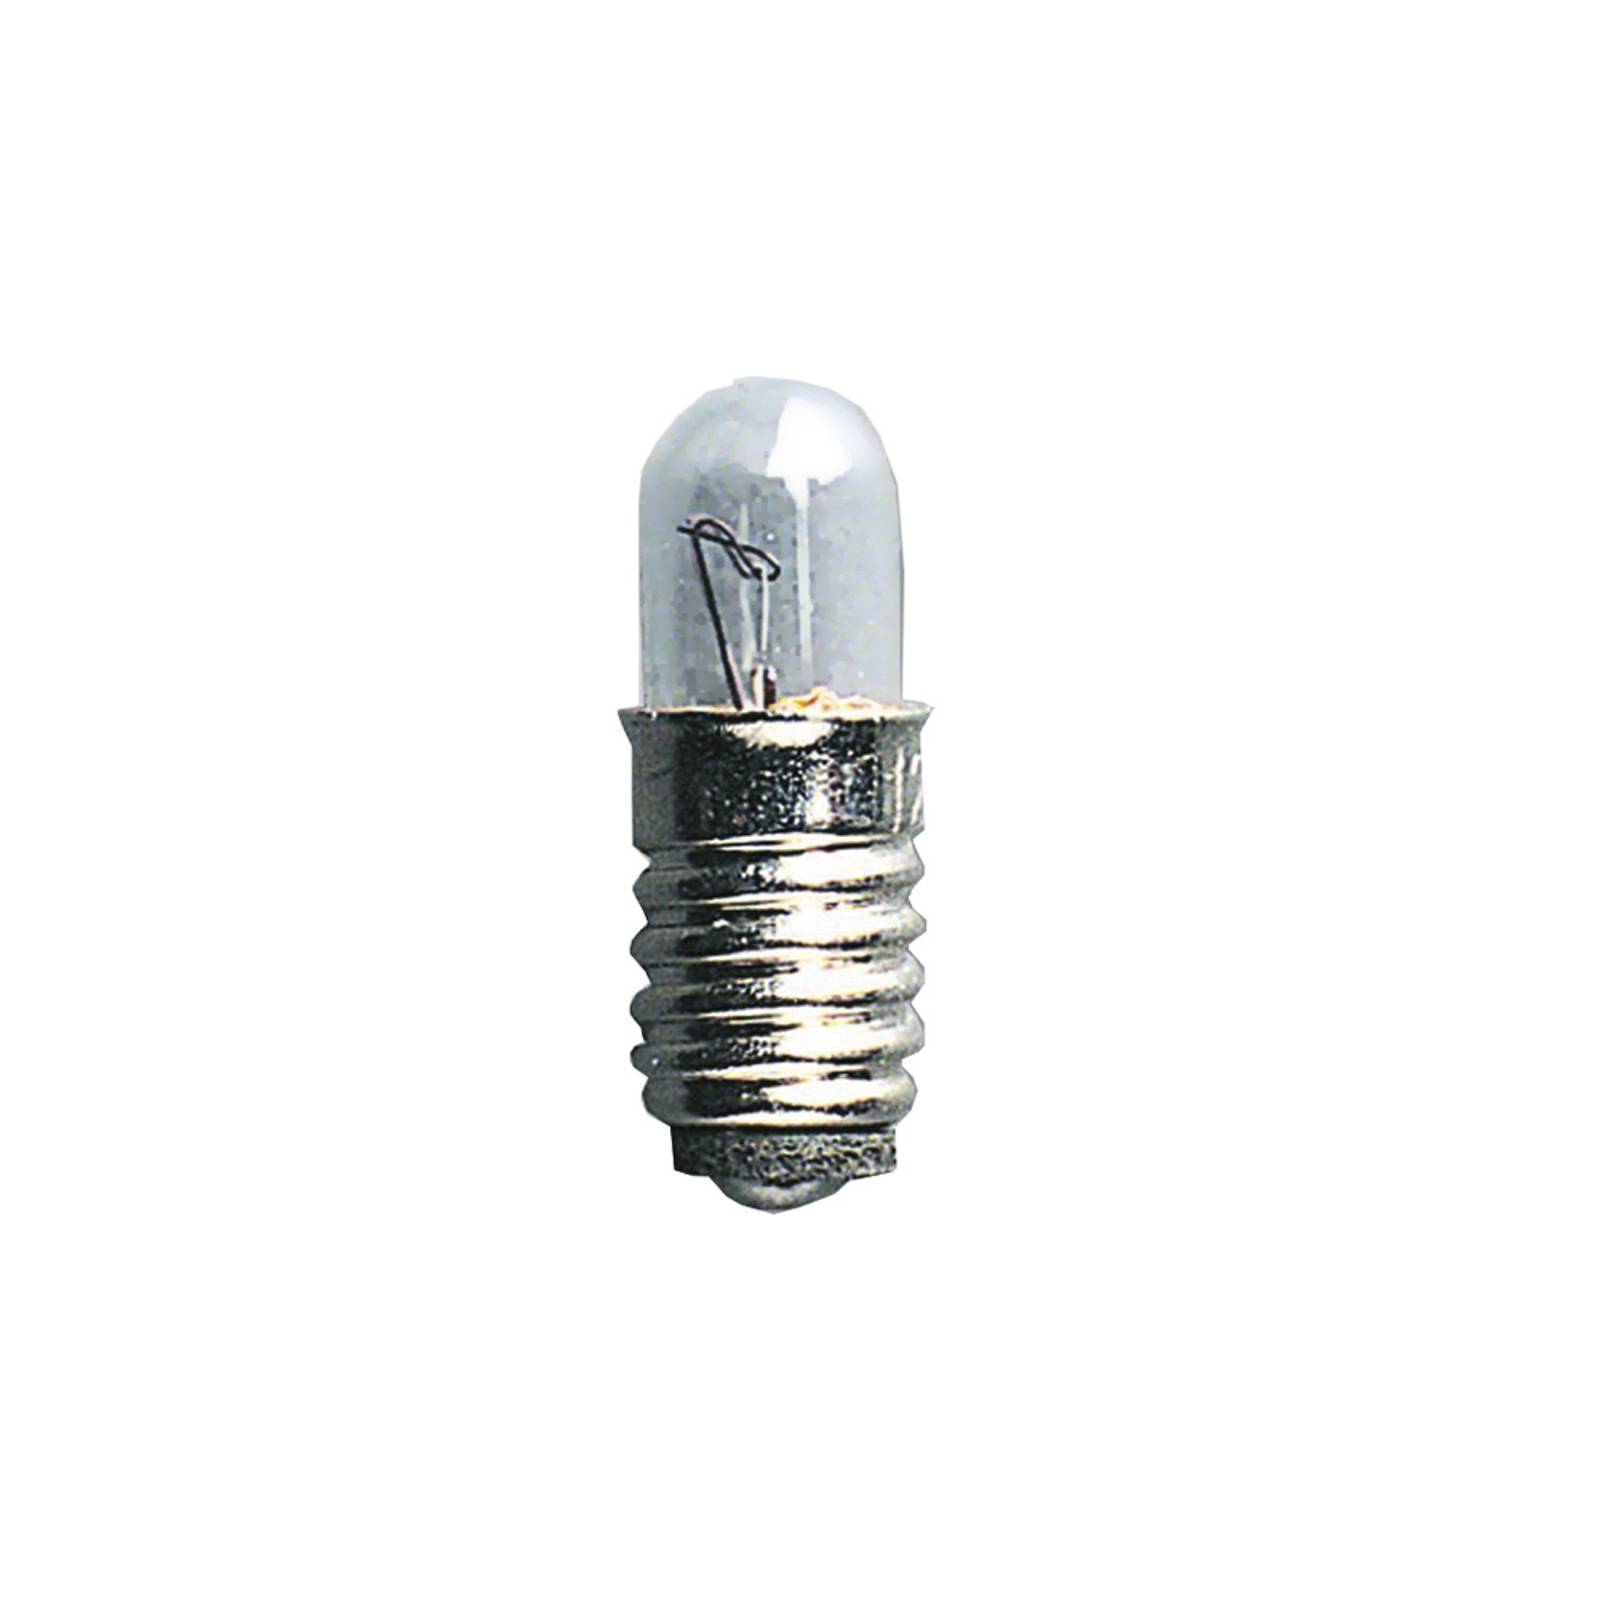 E5 0,6 W 12 V ekstrapærer LS-lampe 5 stk., klar